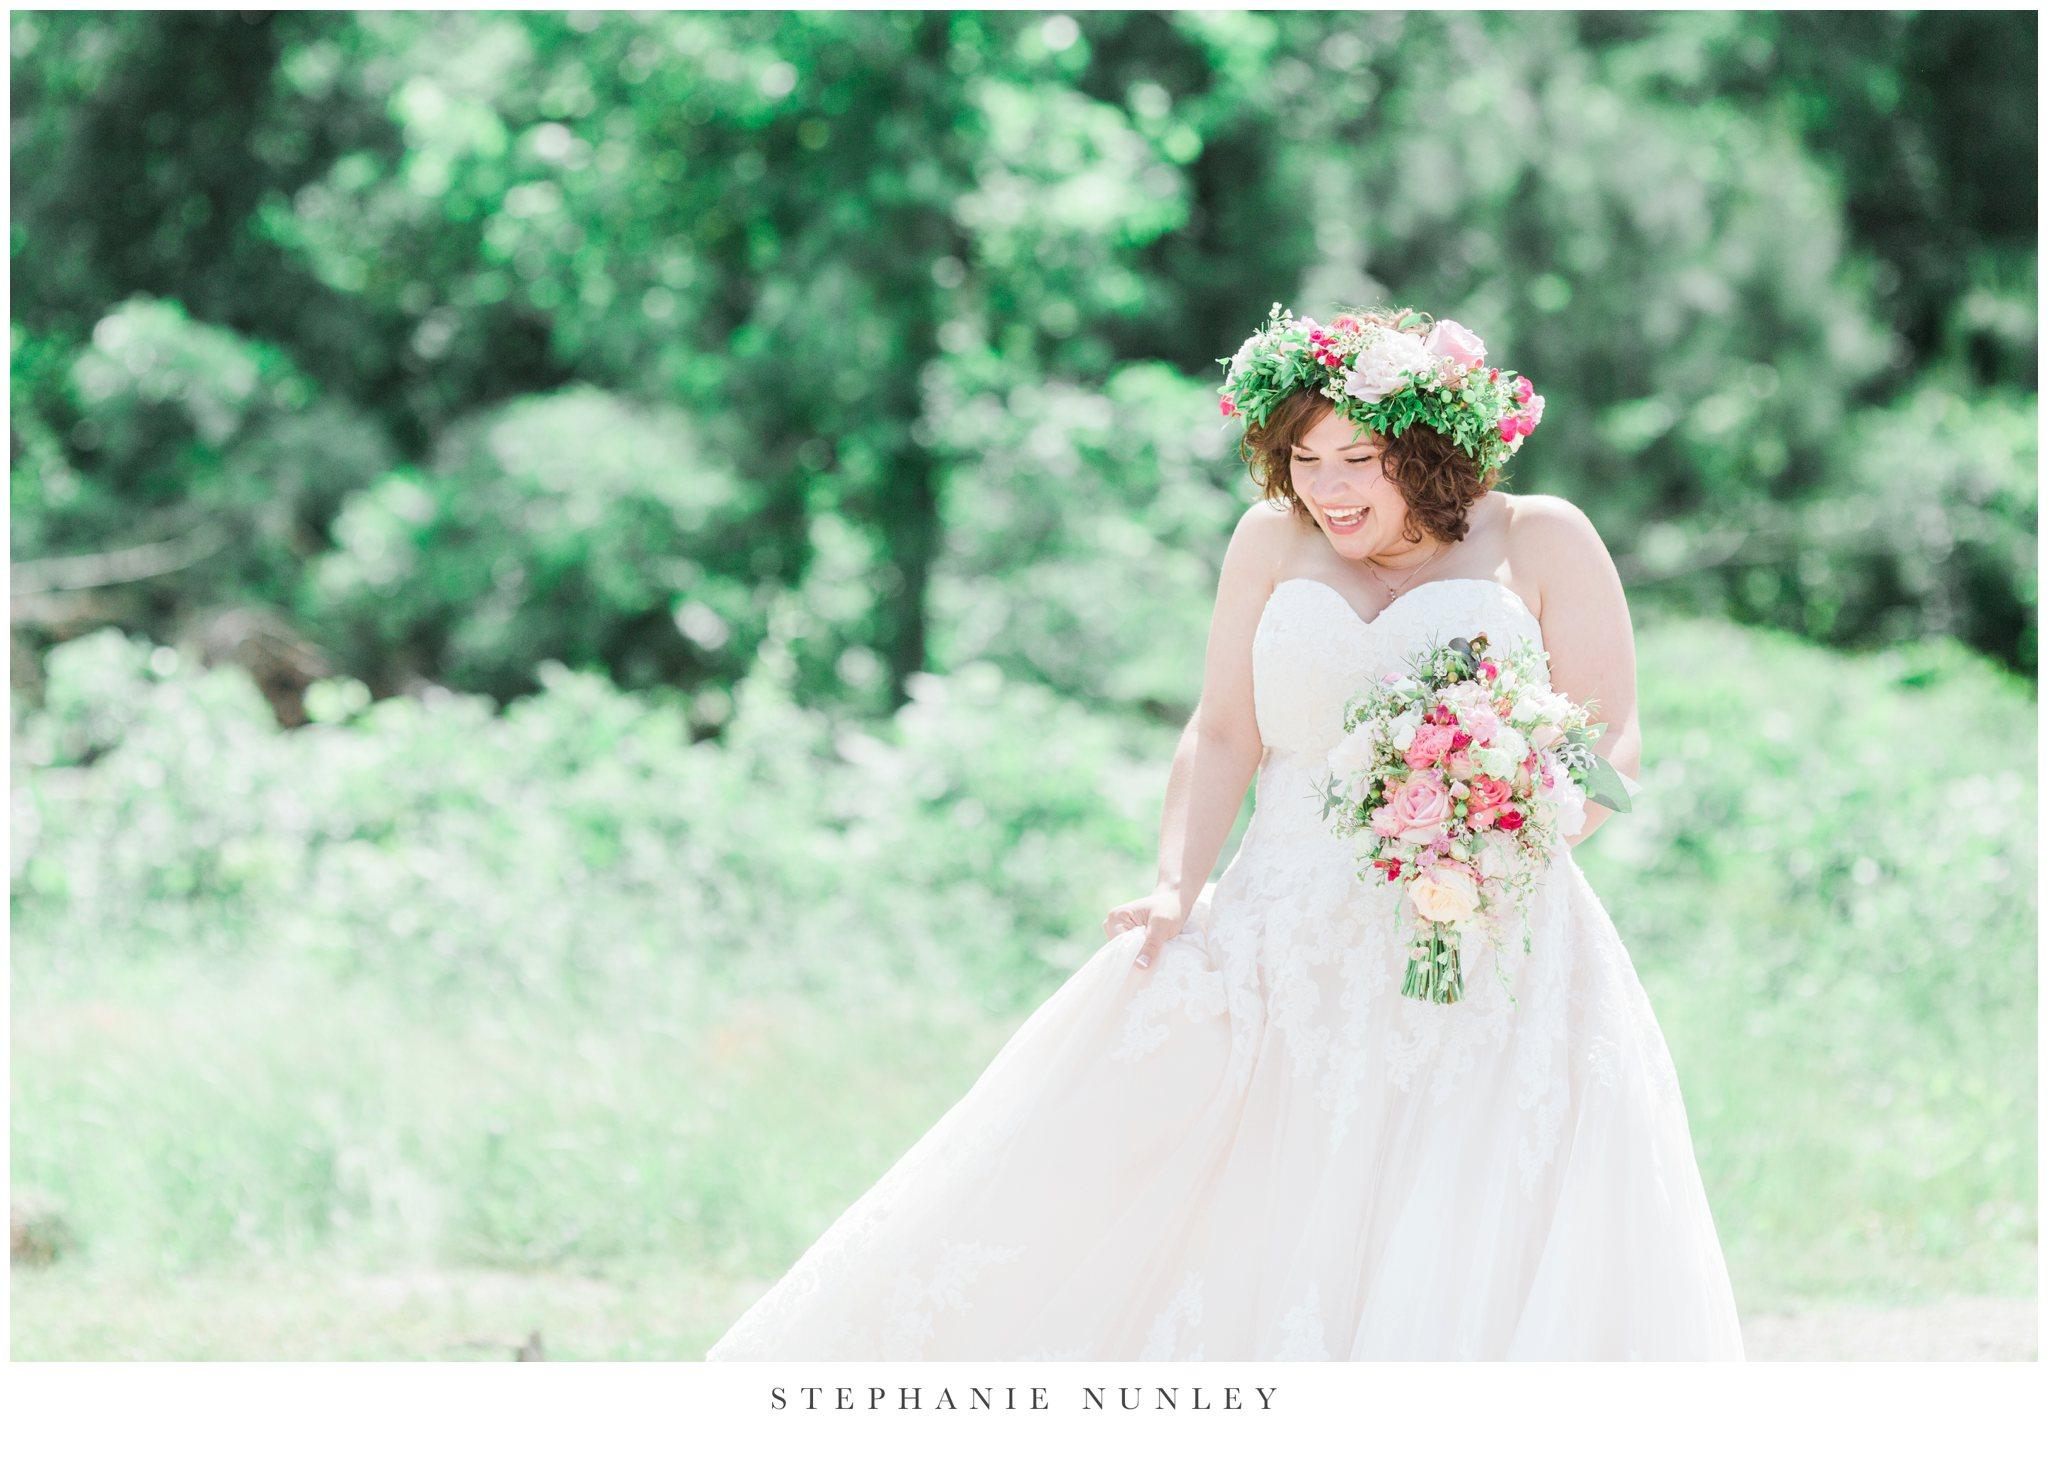 romantic-outdoor-wedding-with-flower-crown-0051.jpg